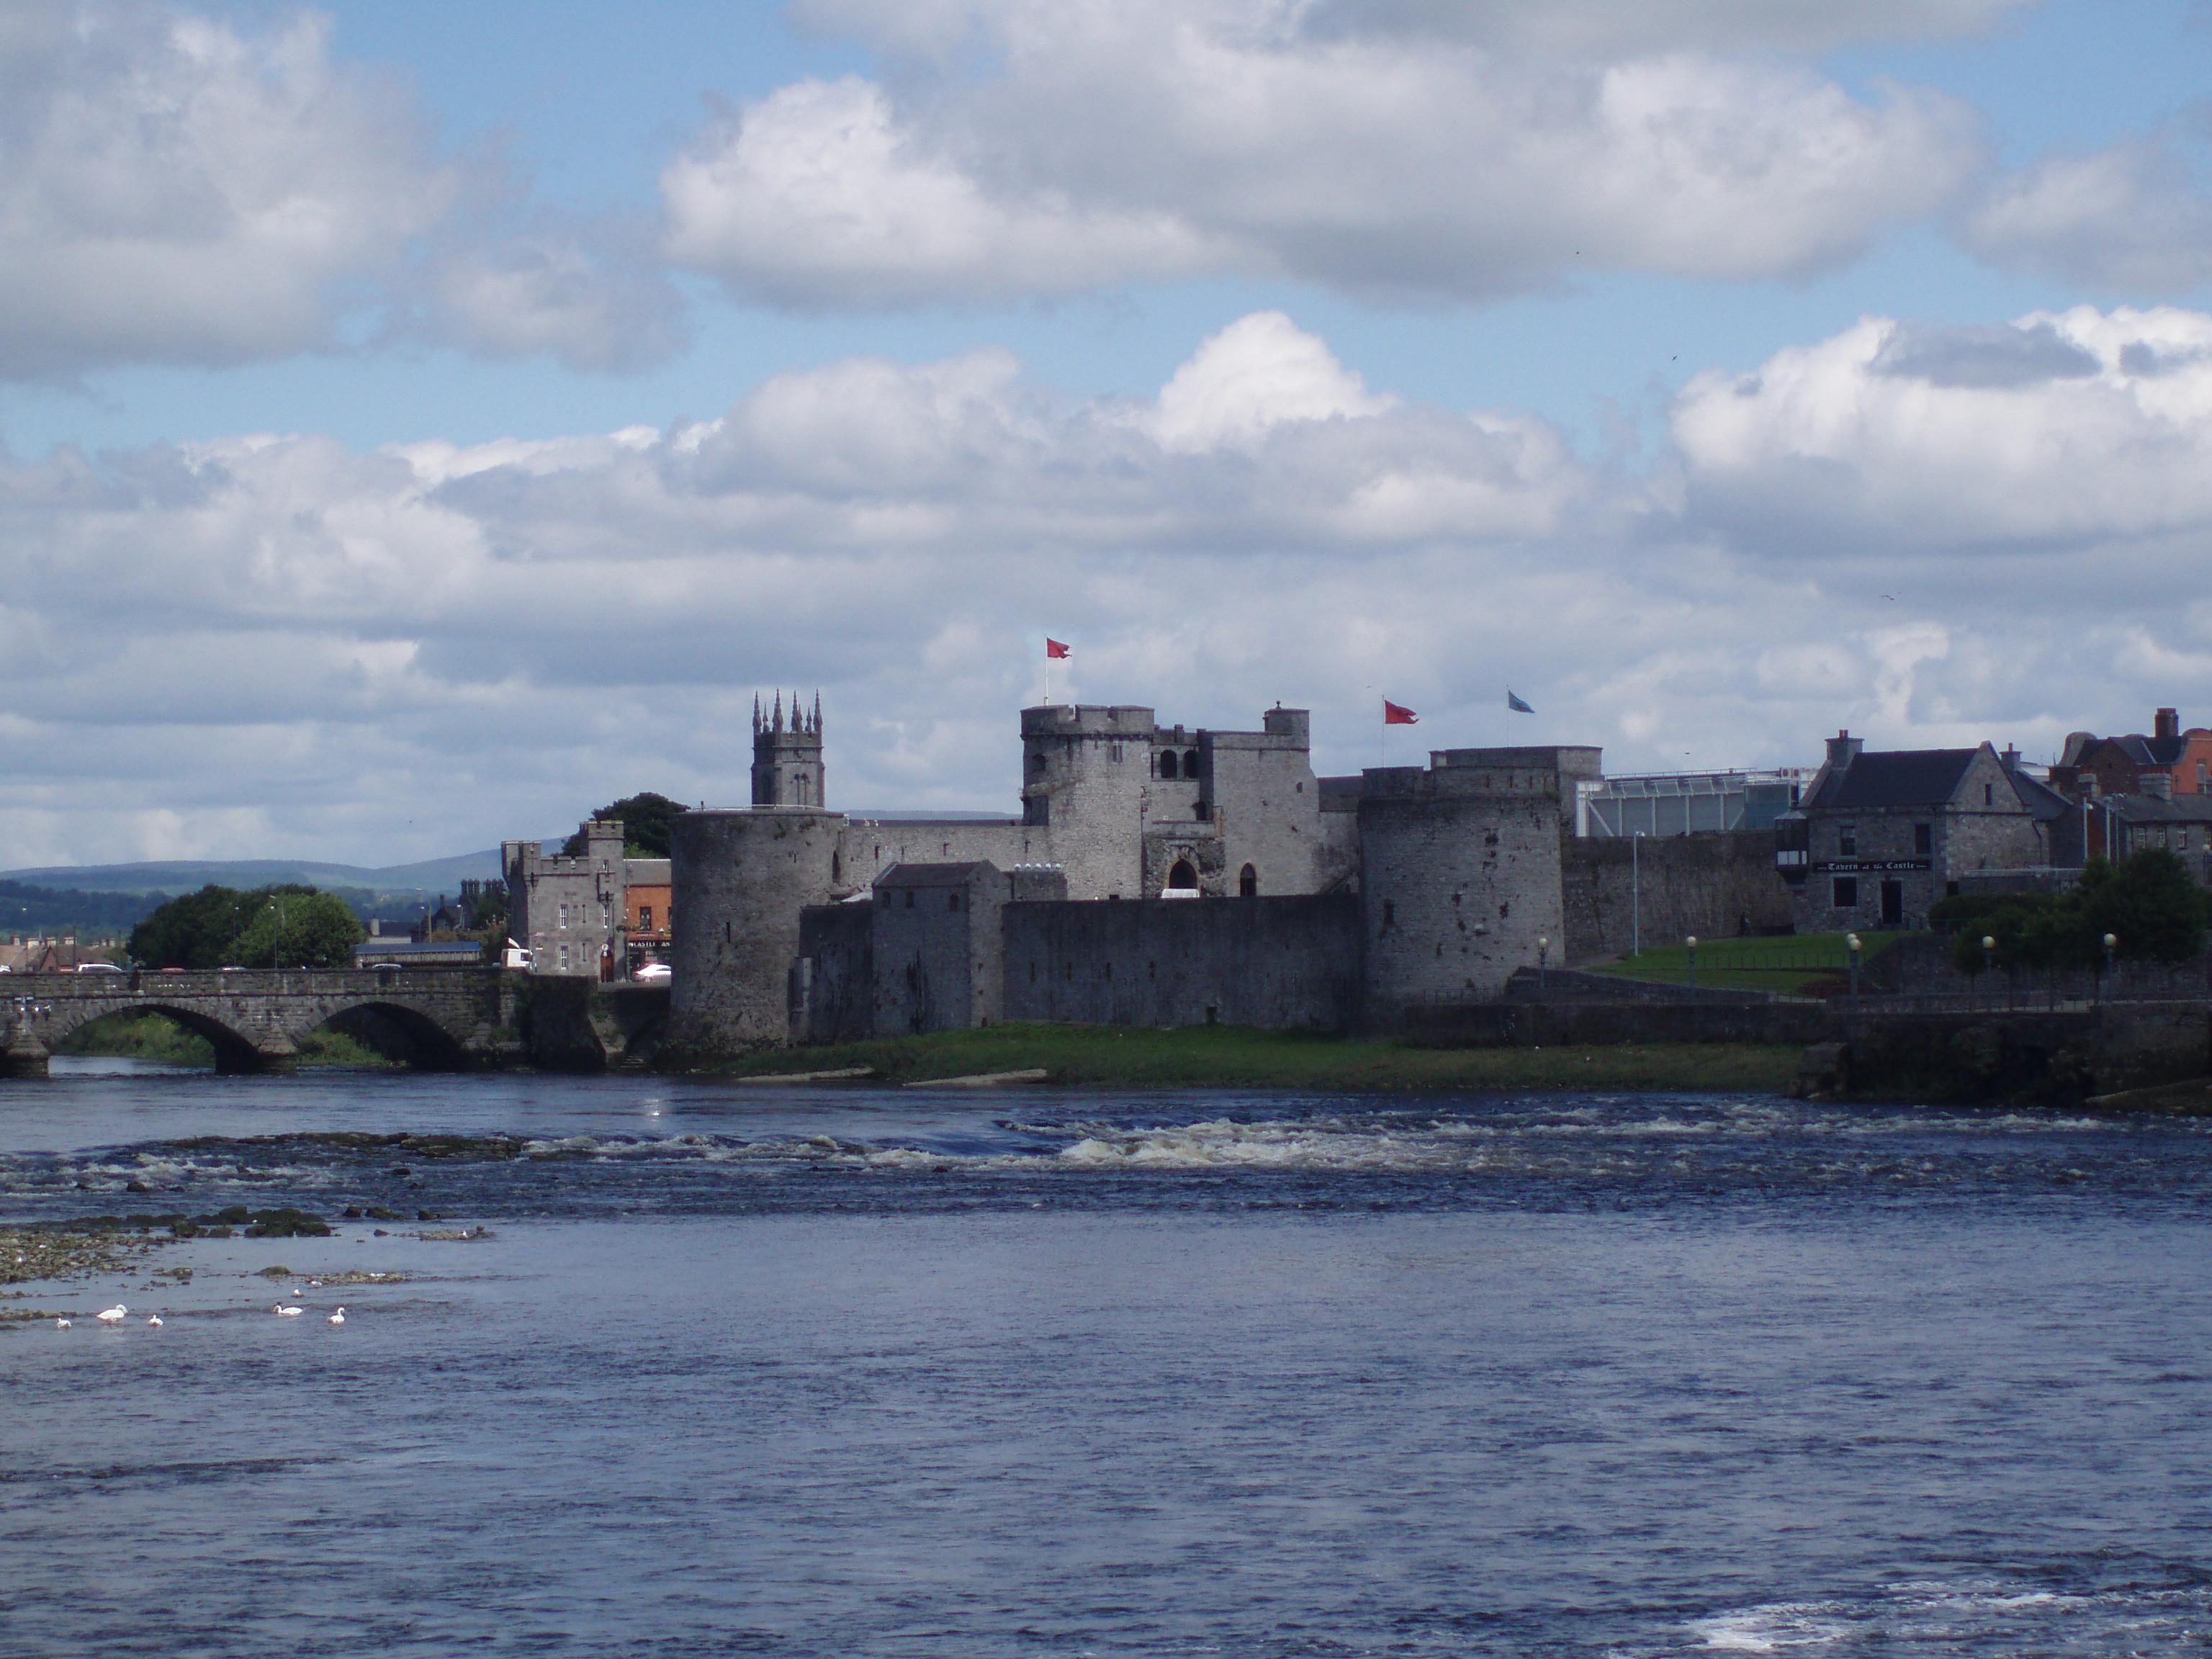 Limerick Ireland  City pictures : Fitxategi:Limerick castle Wikipedia, entziklopedia askea.